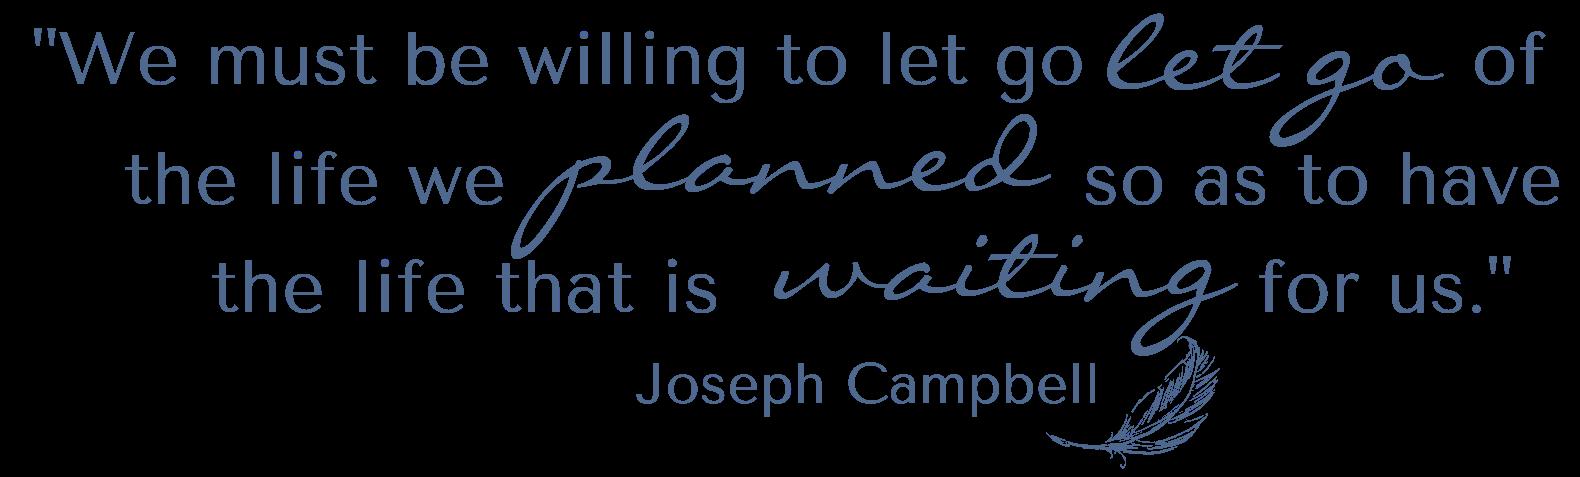 Joseph Campbel Quote Website.png